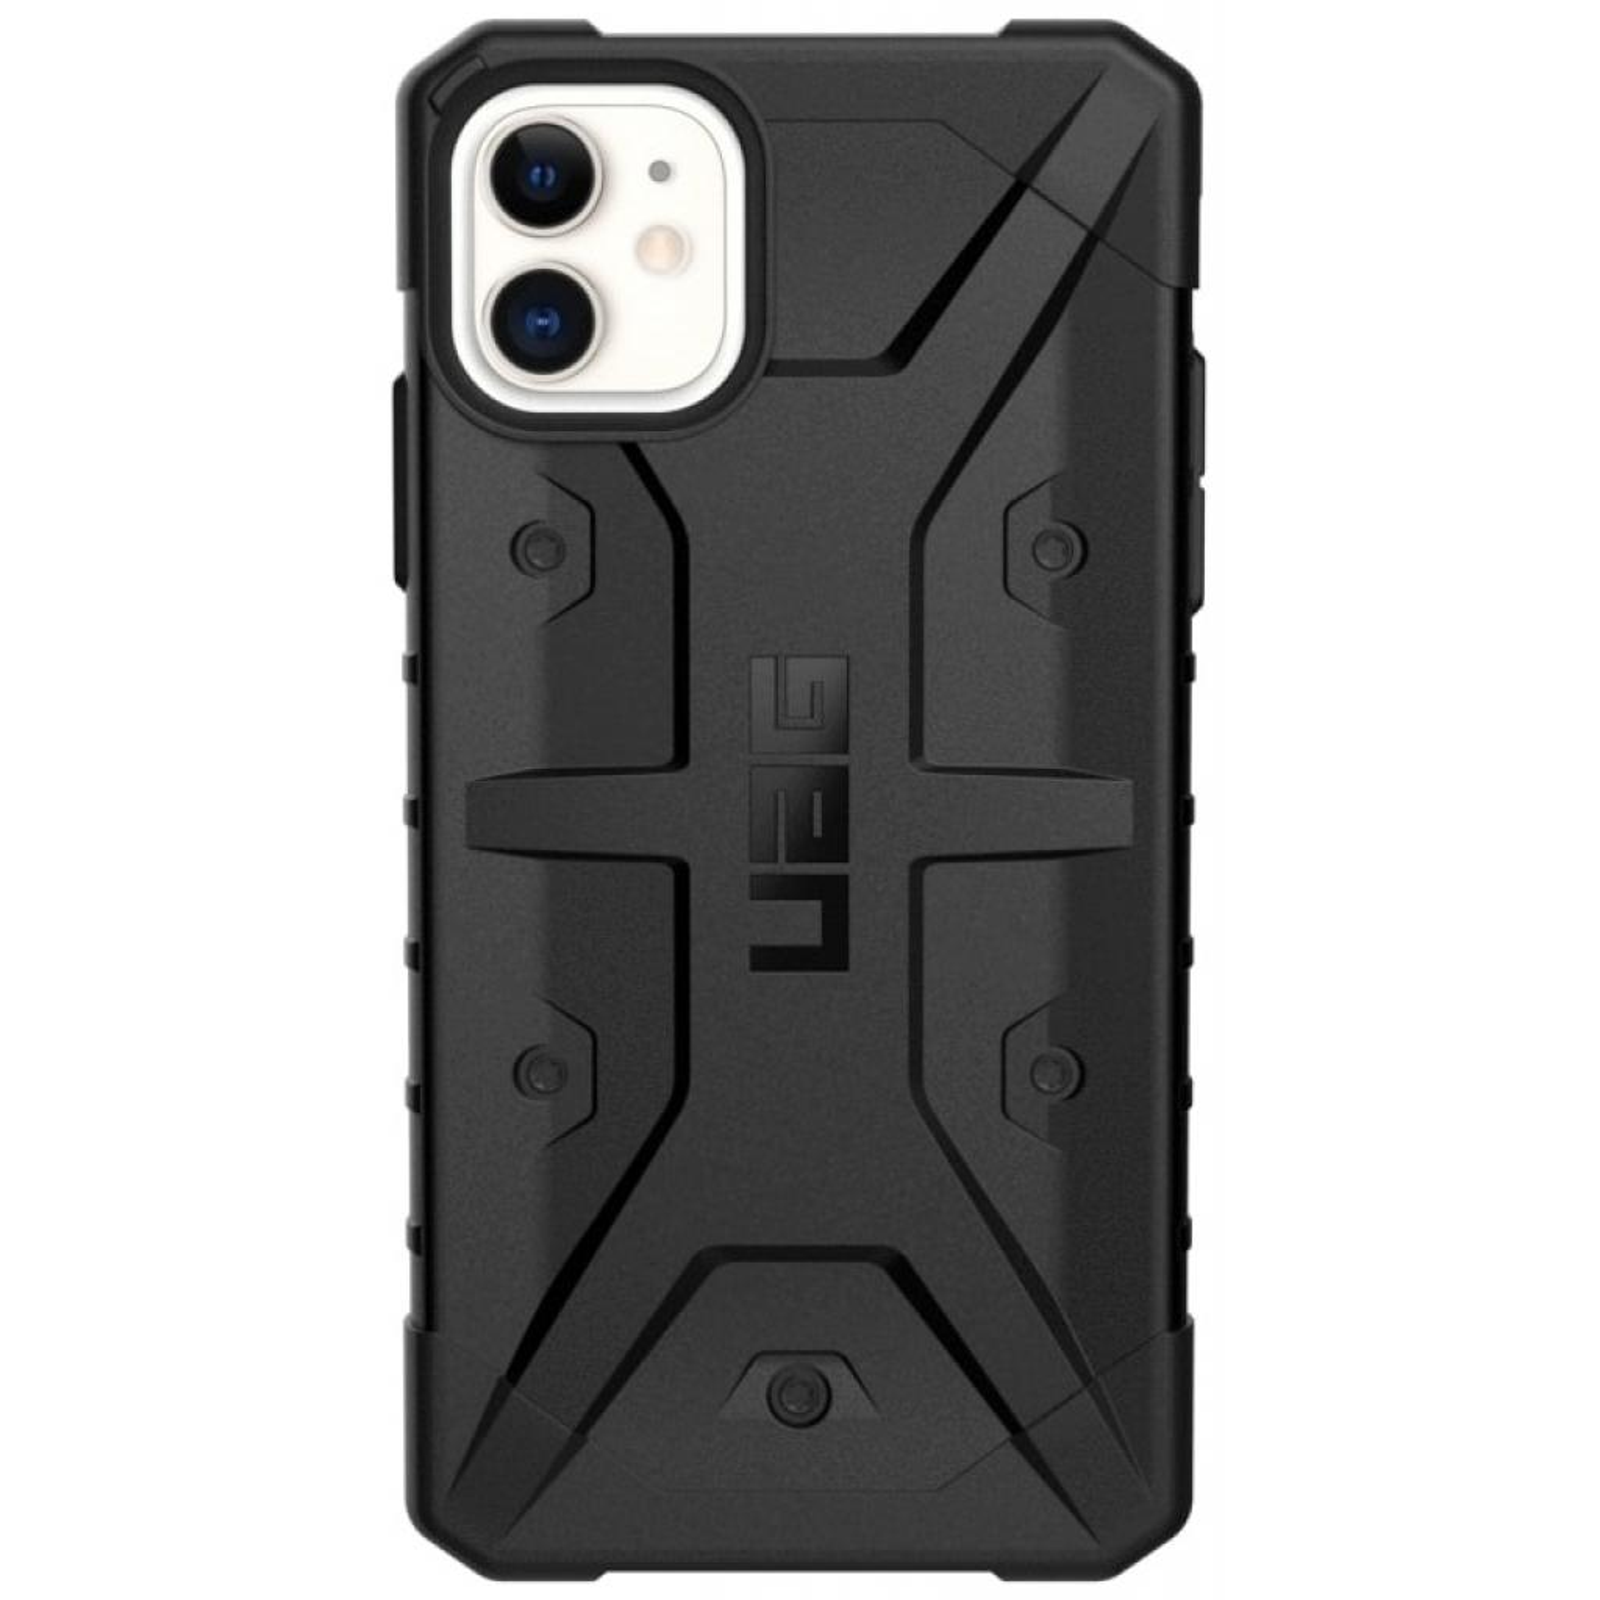 Чехол для моб. телефона Uag iPhone 11 Pathfinder, Black (111717114040)